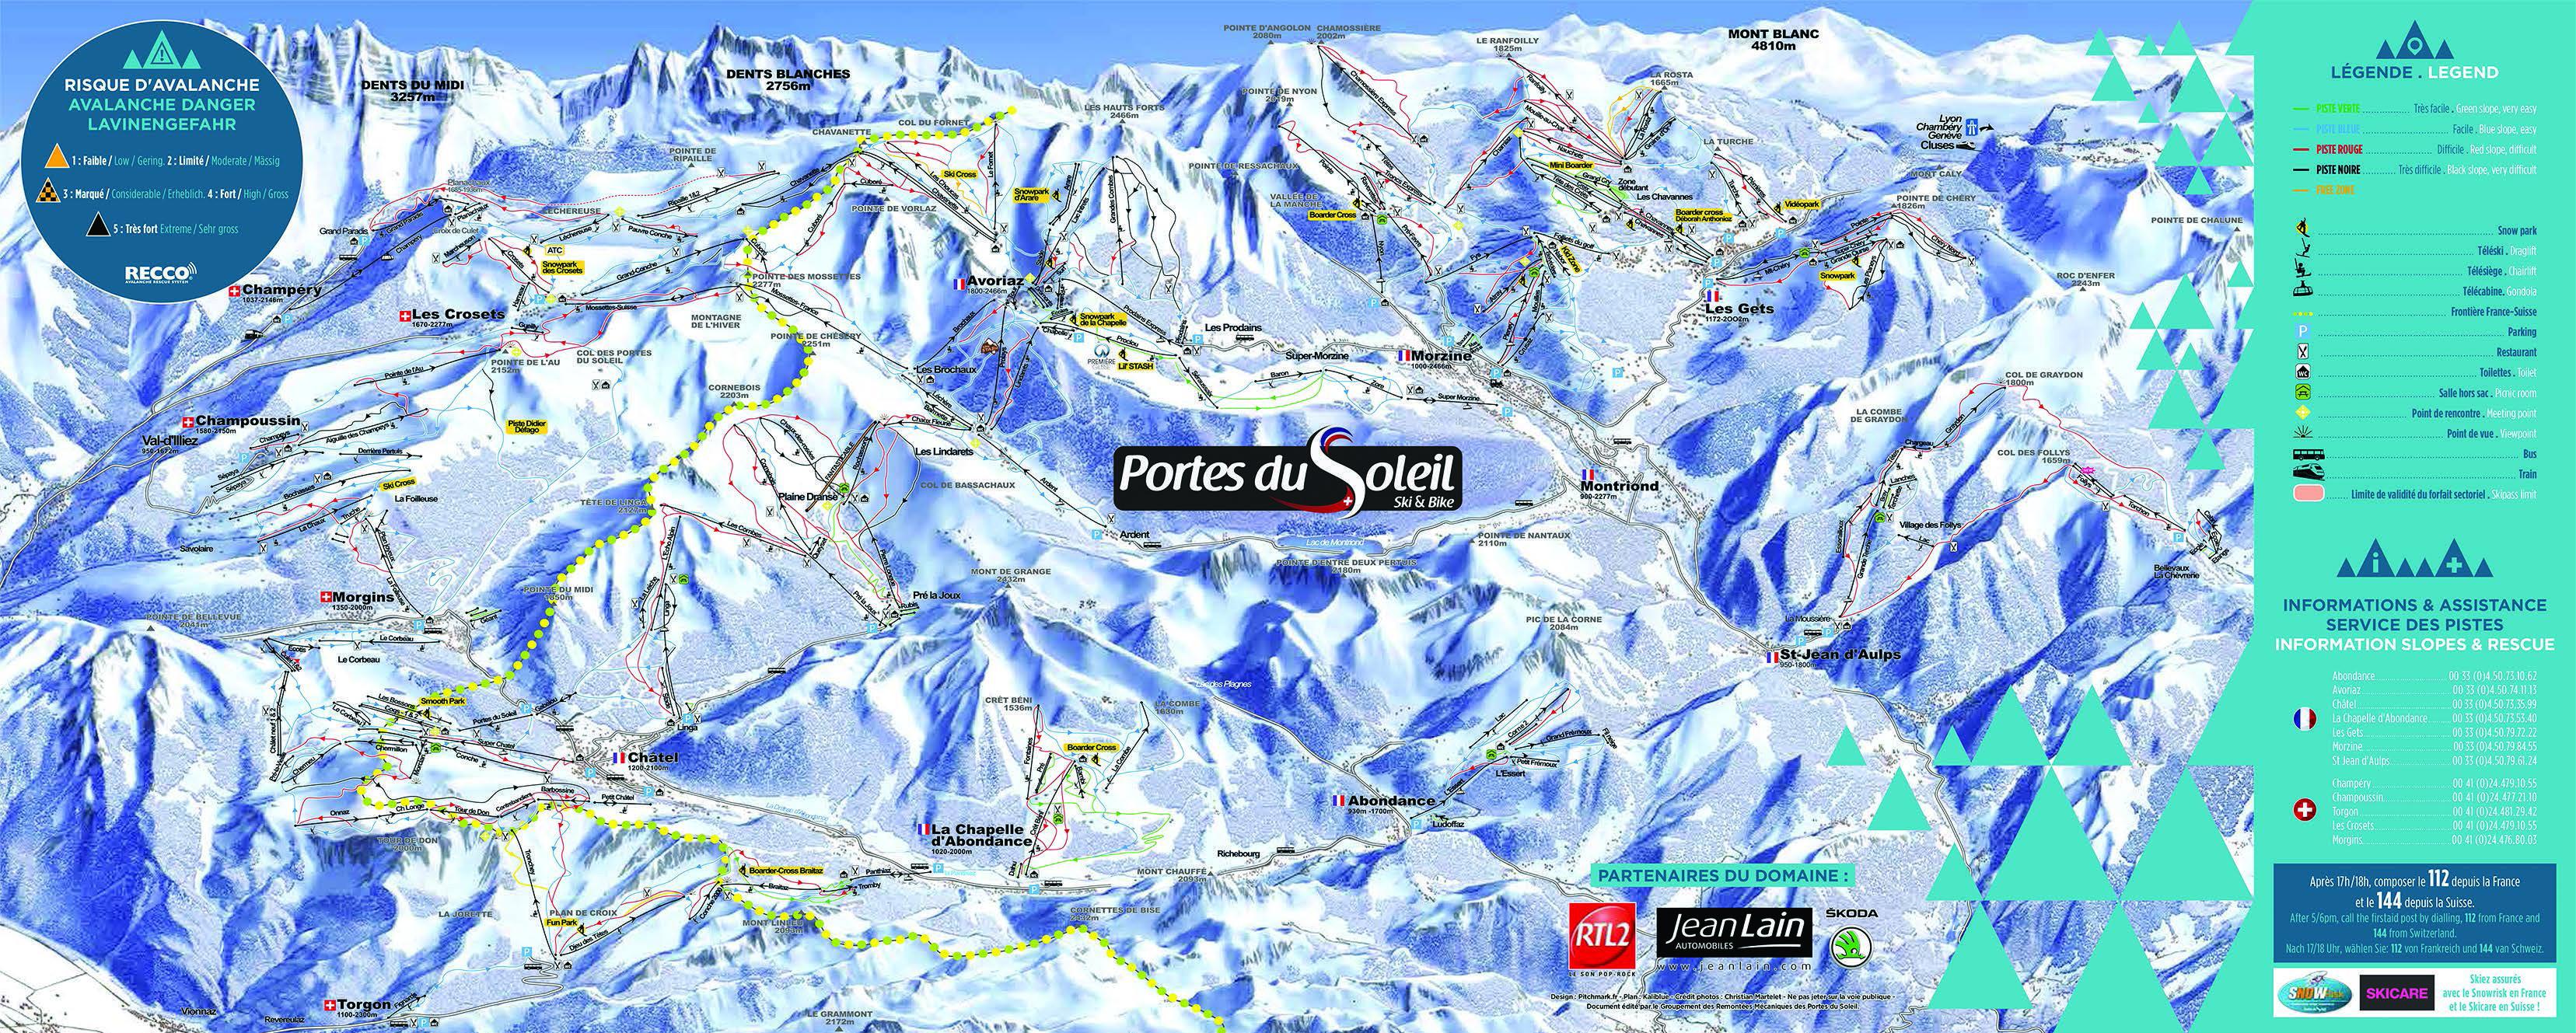 Portes du Soleil Trail Map • Piste Map • Panoramic Mountain Map